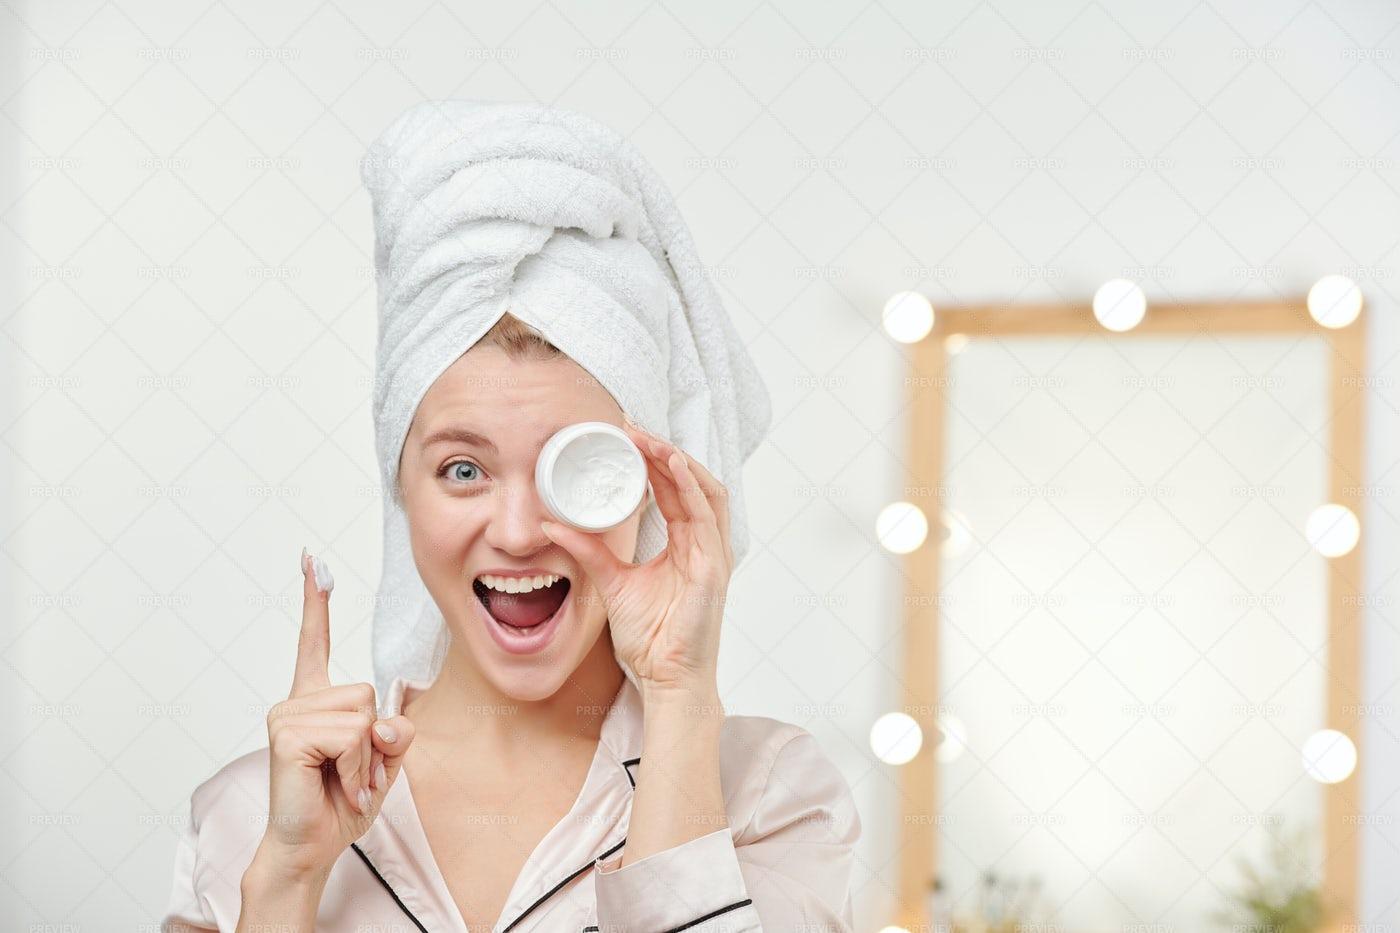 Ecstatic Girl With Towel On Head...: Stock Photos